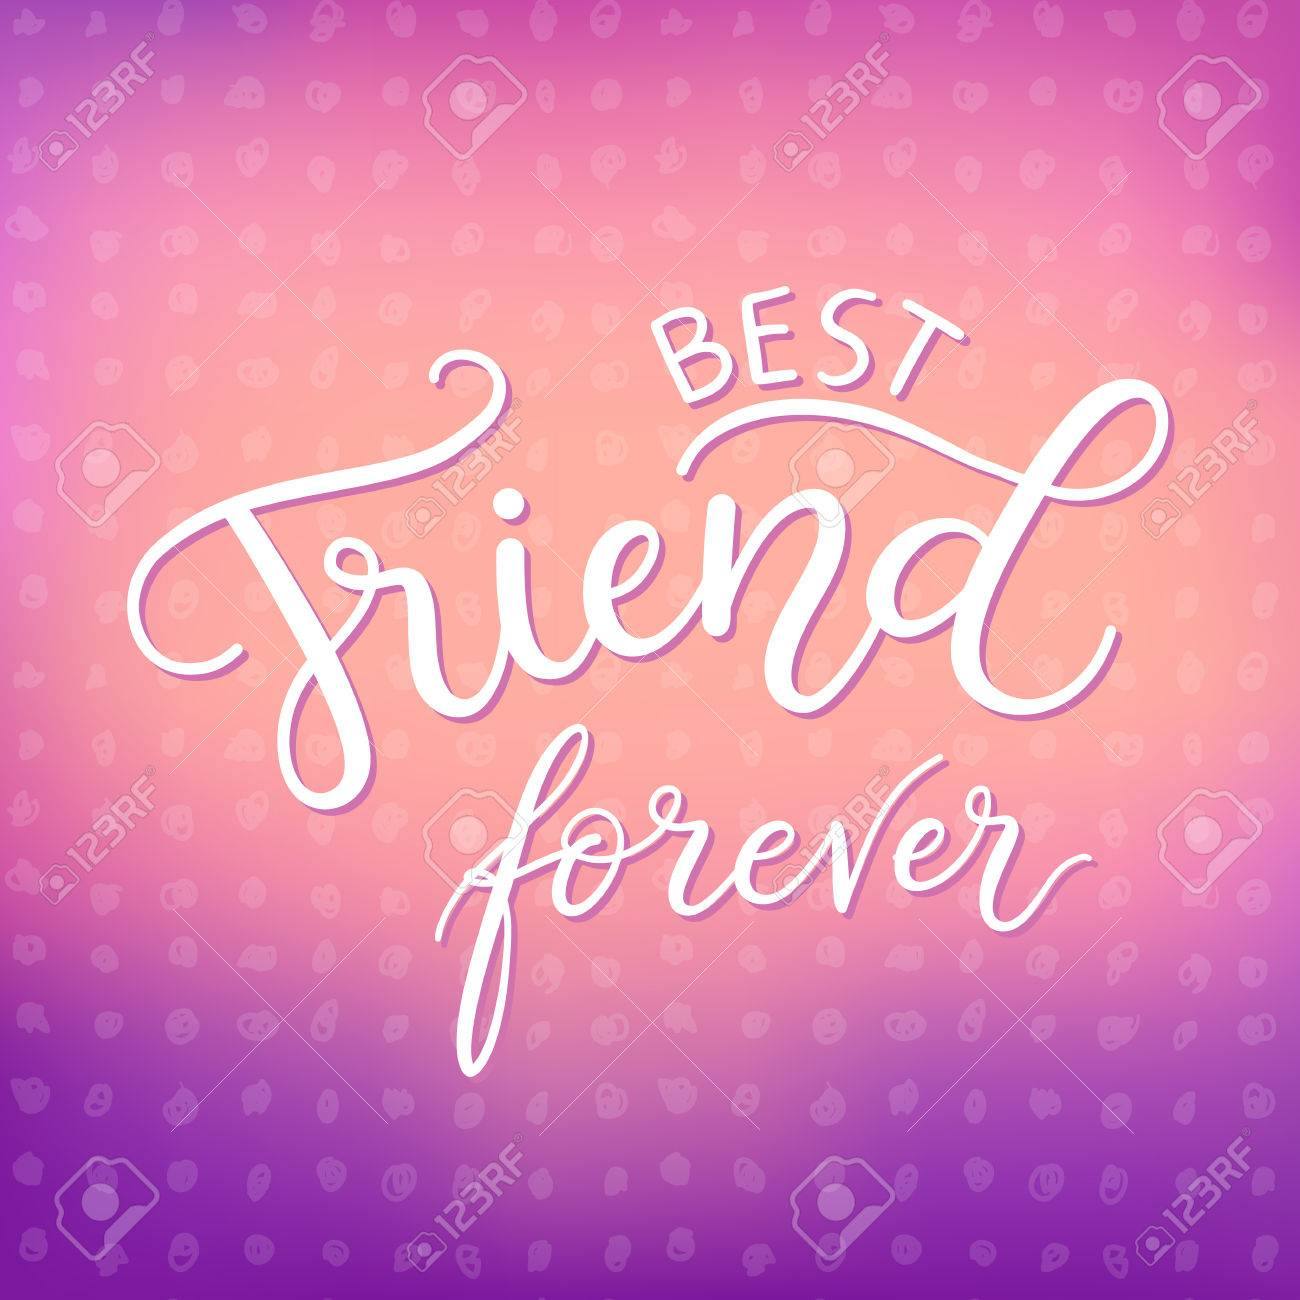 Best Friends Forever Fashion Print Design Modern Typographic – Friendship Card Template